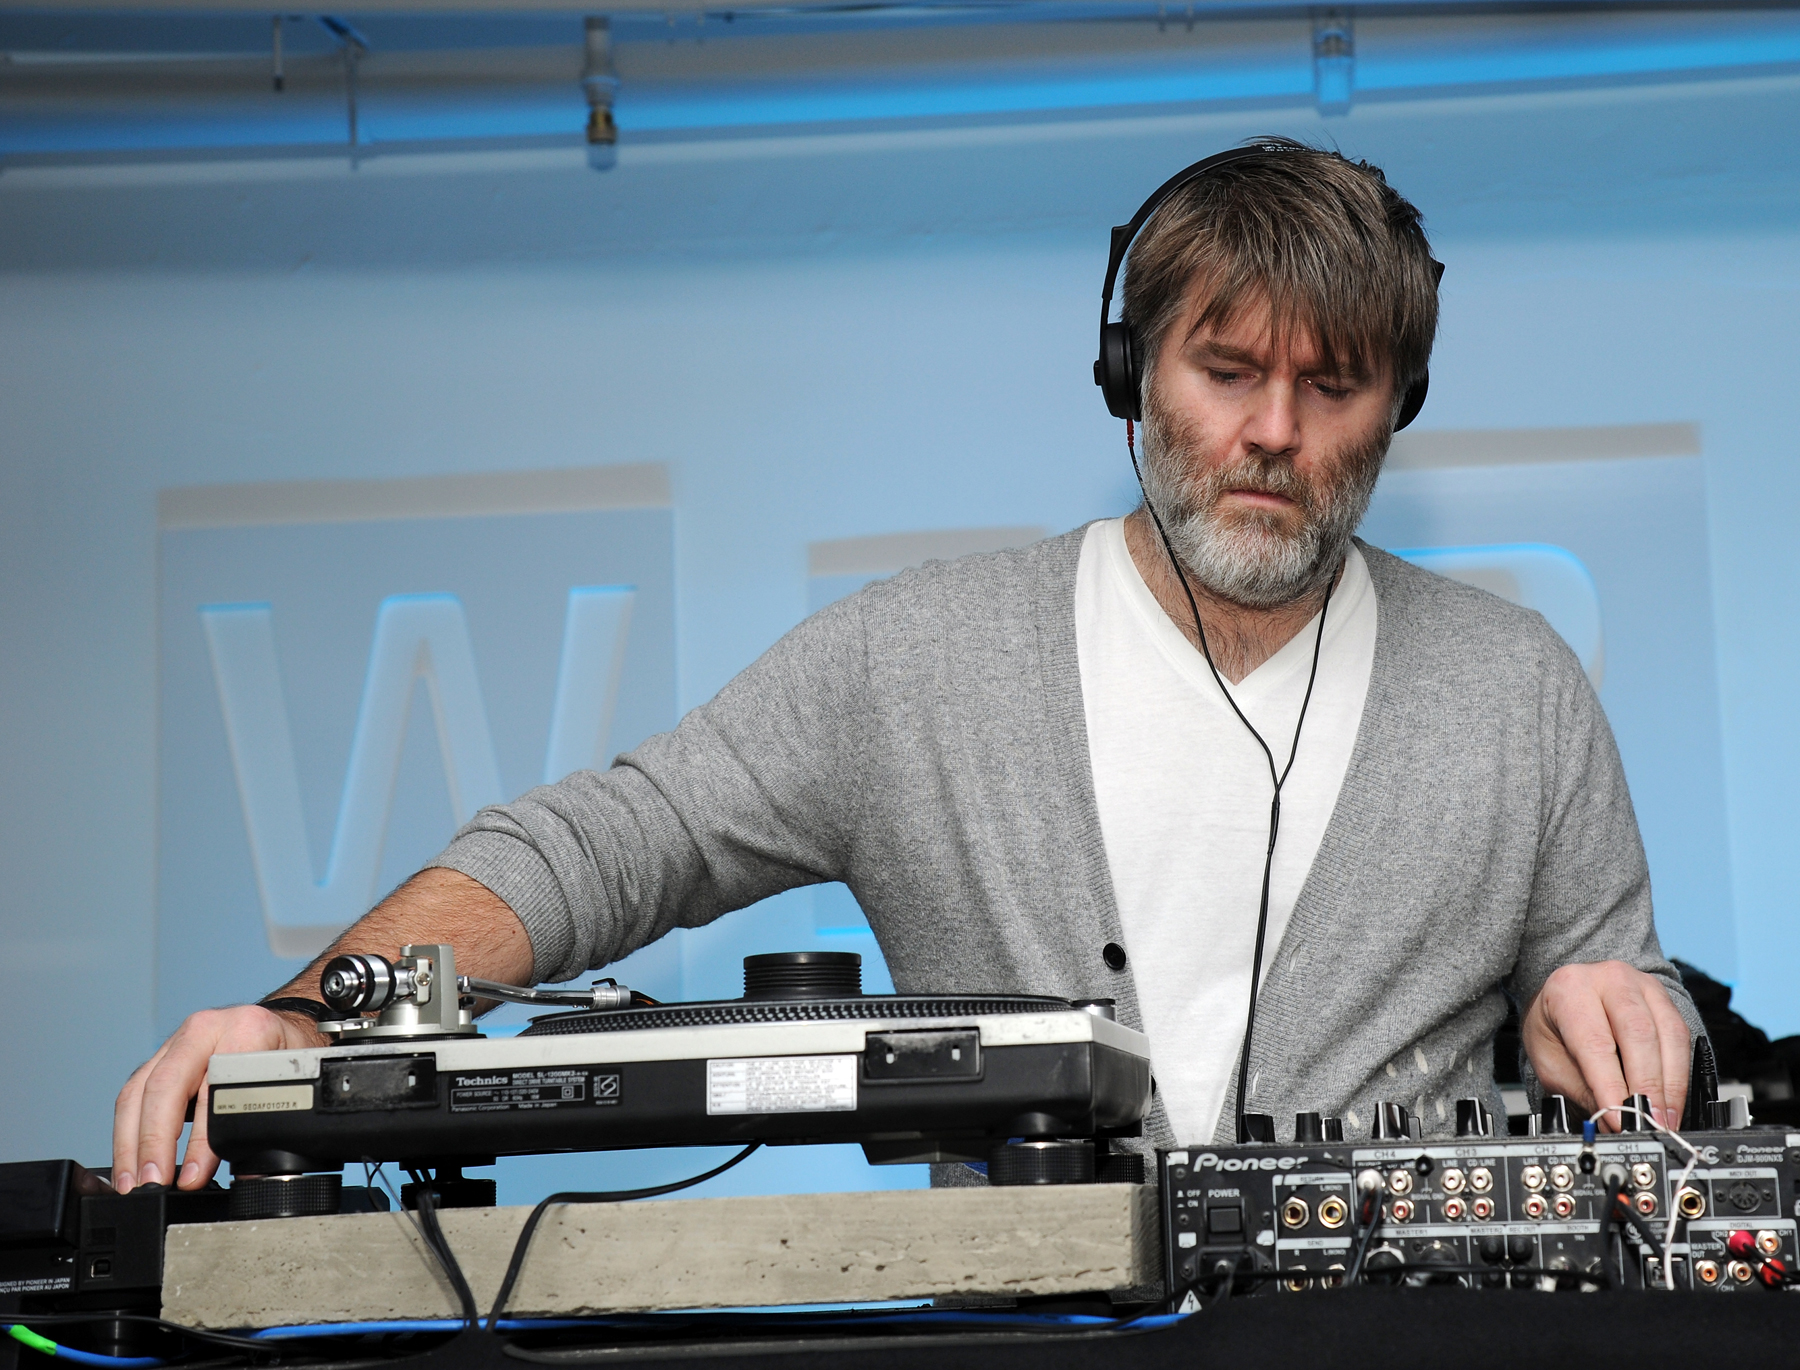 James Murphy on Despacio, LCD Soundsystem\'s Live Album and New Music ...